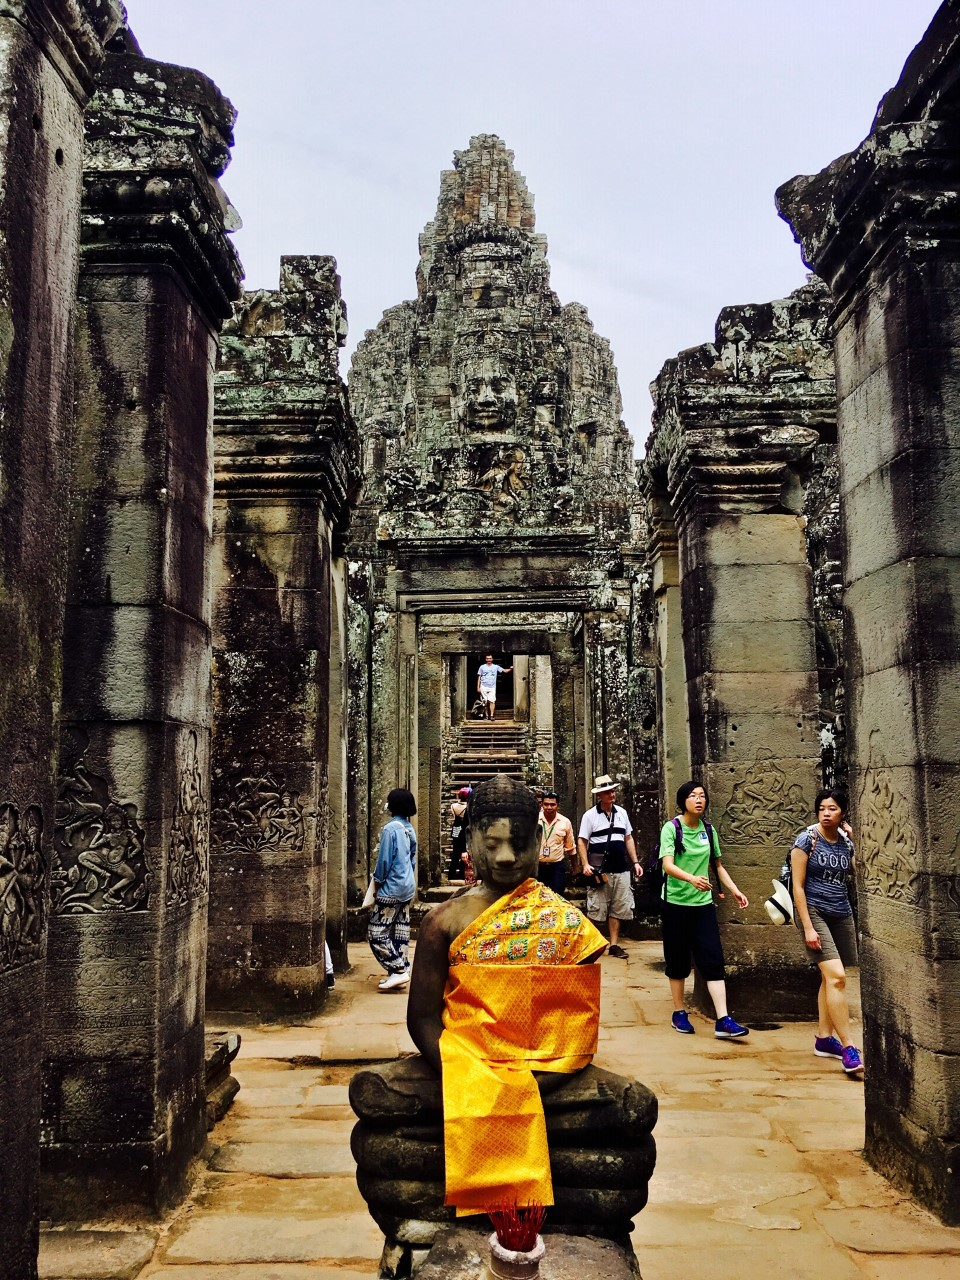 Angkor Thom Bayon 13th Century by JennySkyIsTheLimit